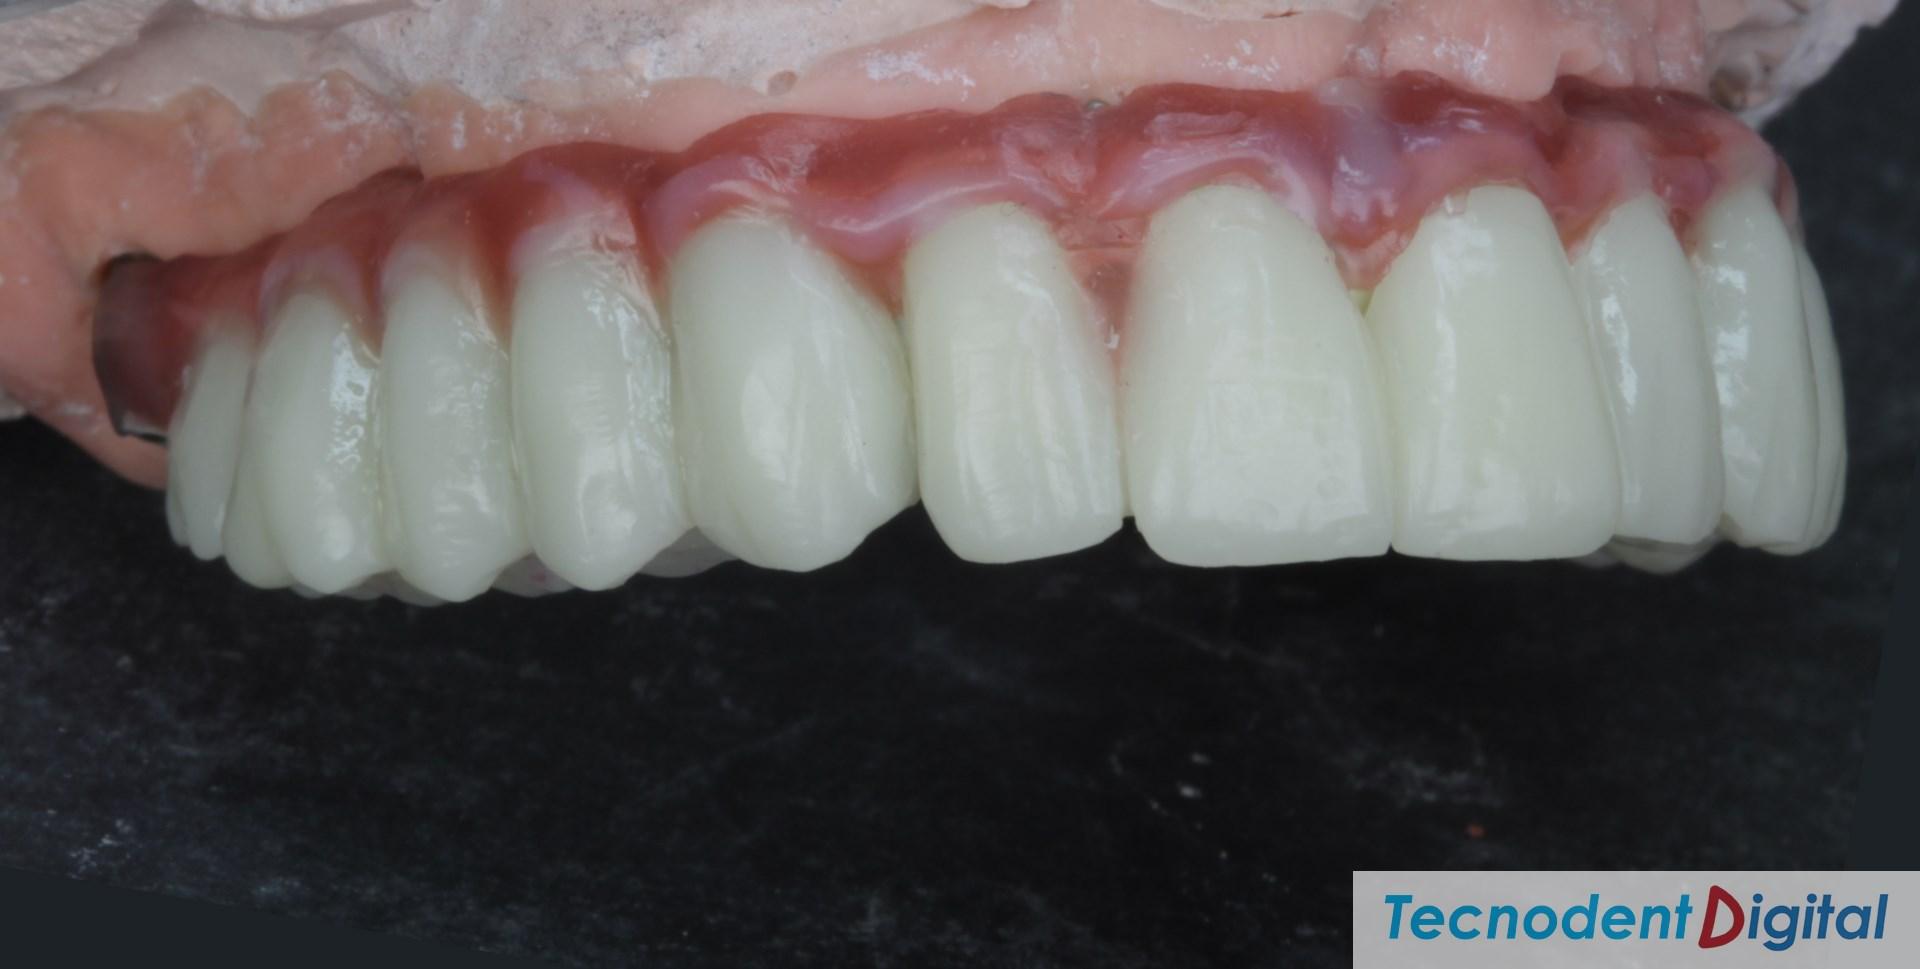 Rehabilitacion sobre implantes Exocad thimble coronas HIPC canal ocultado y gingiva